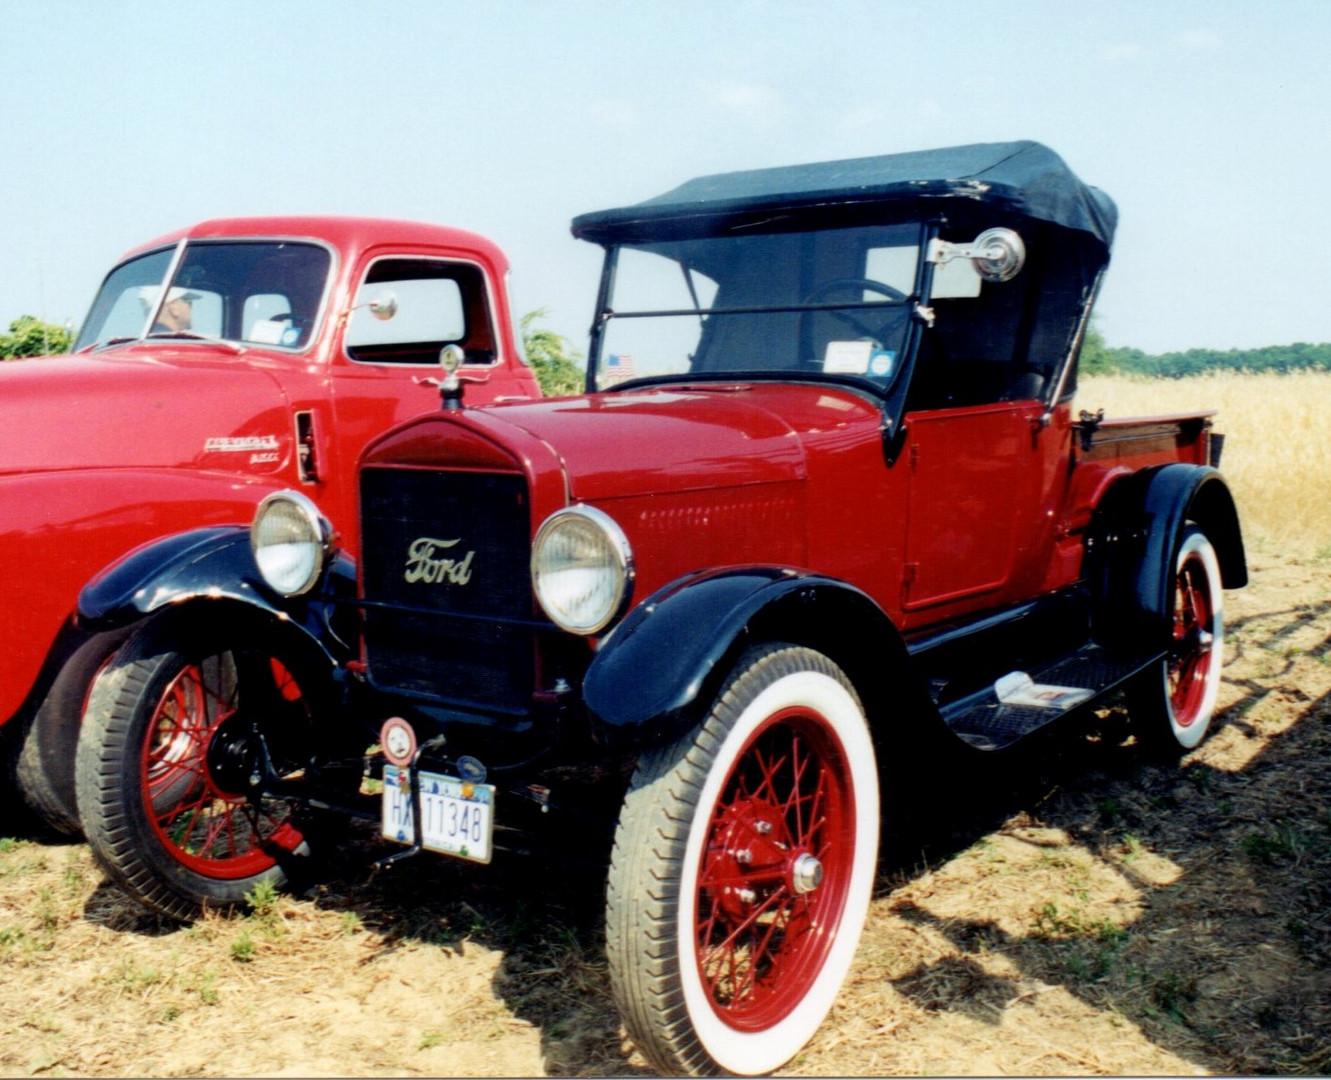 1926 Ford Model T Roadster pickup - Joe Tavernese